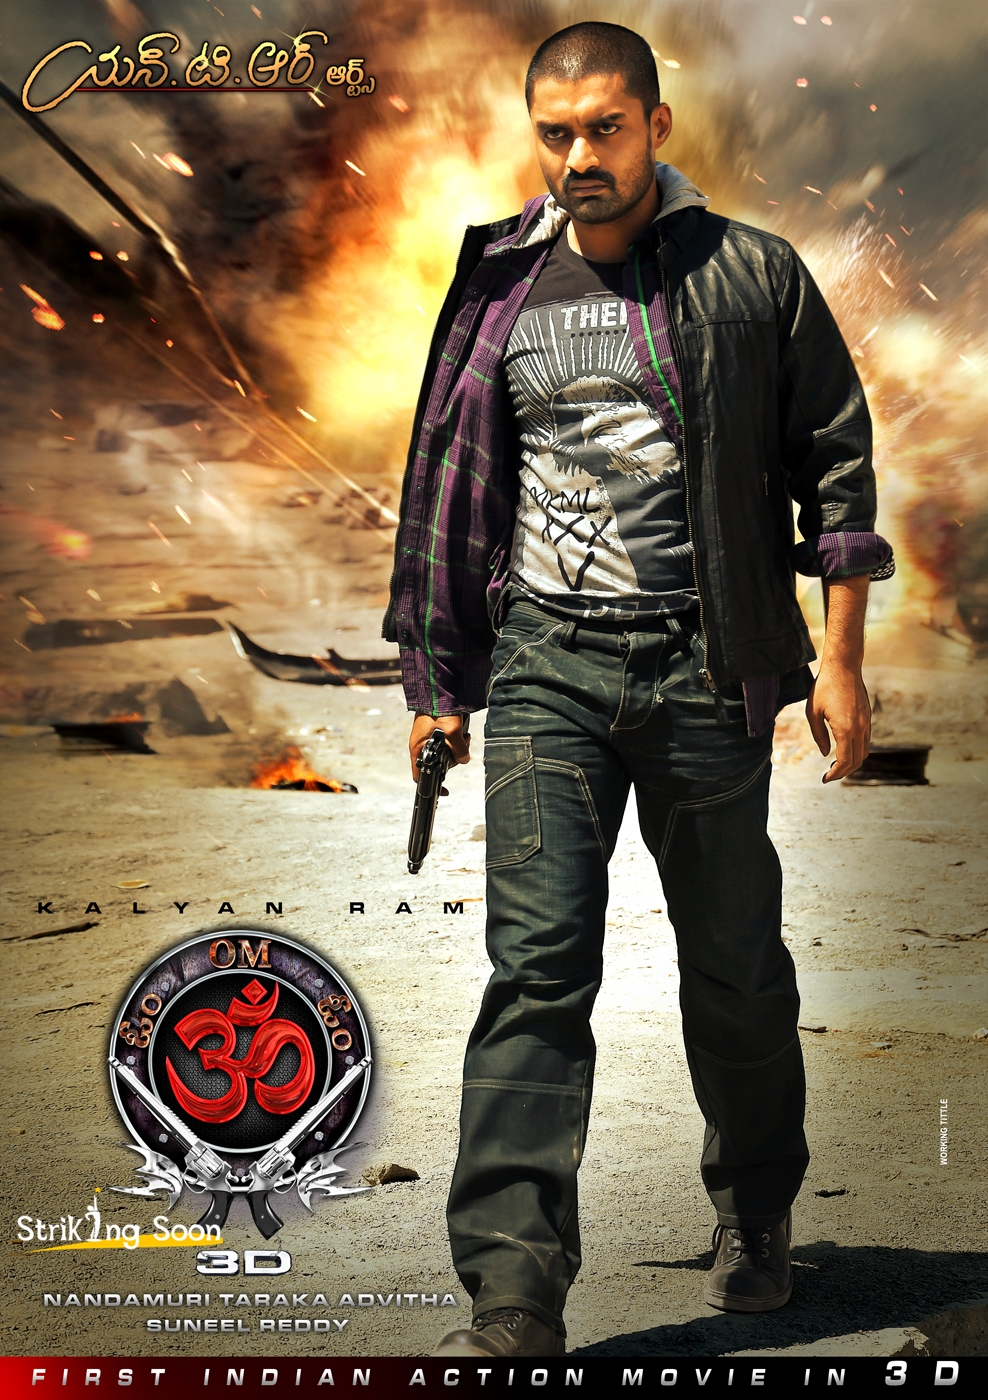 Kalyan Ram Om Movie Wallpapers Posters